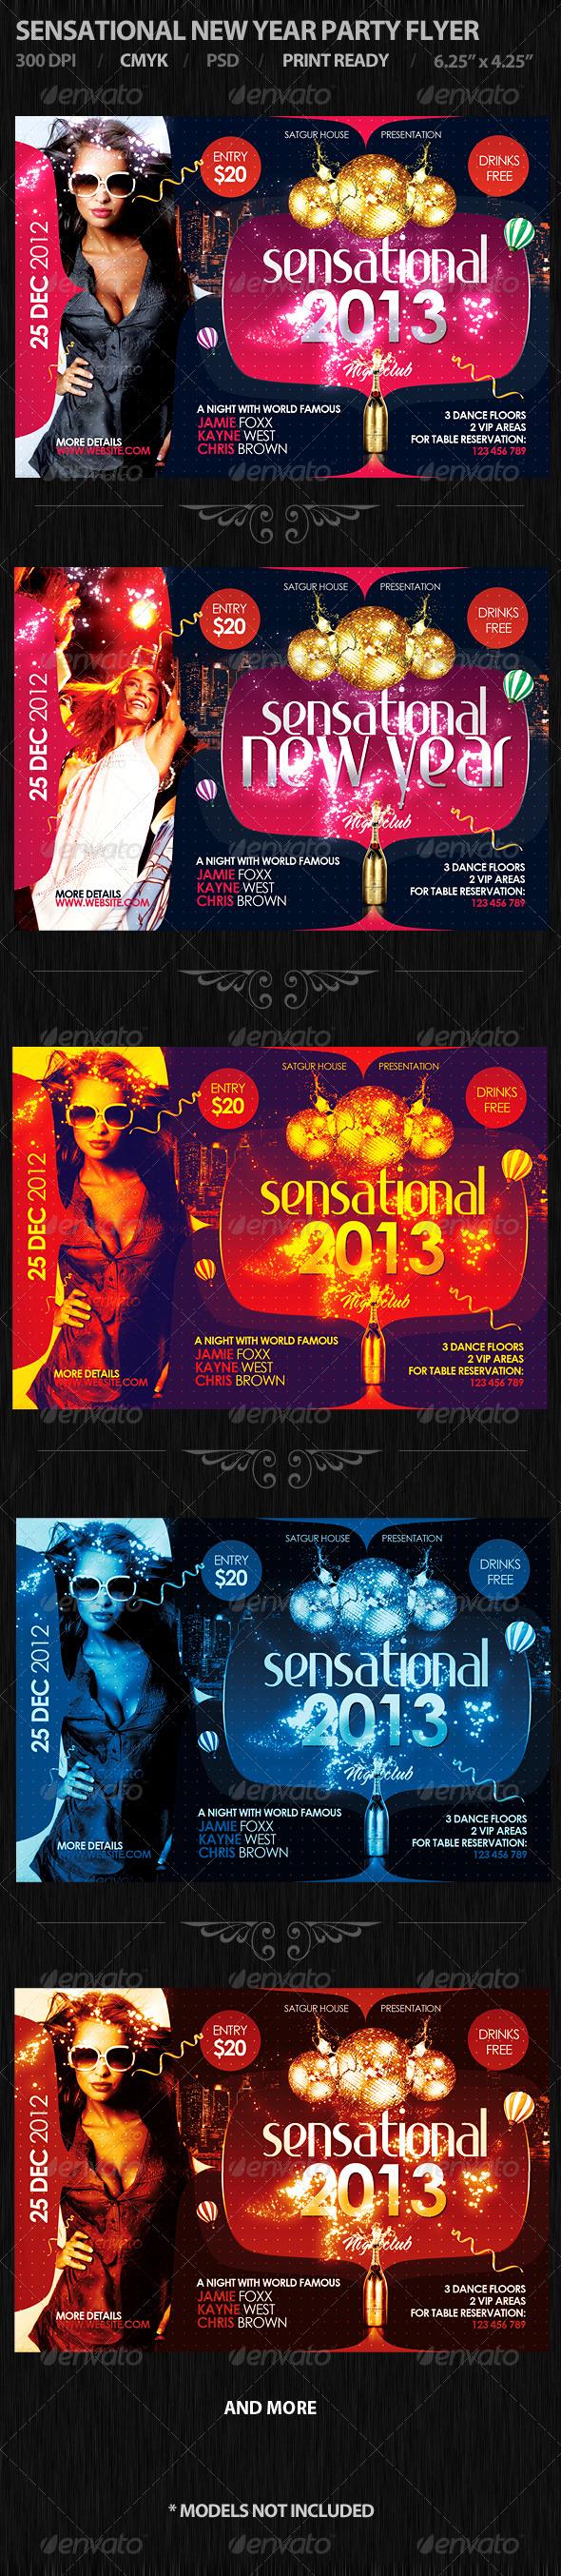 Sensational New Year Party Flyer - Flyers Print Templates